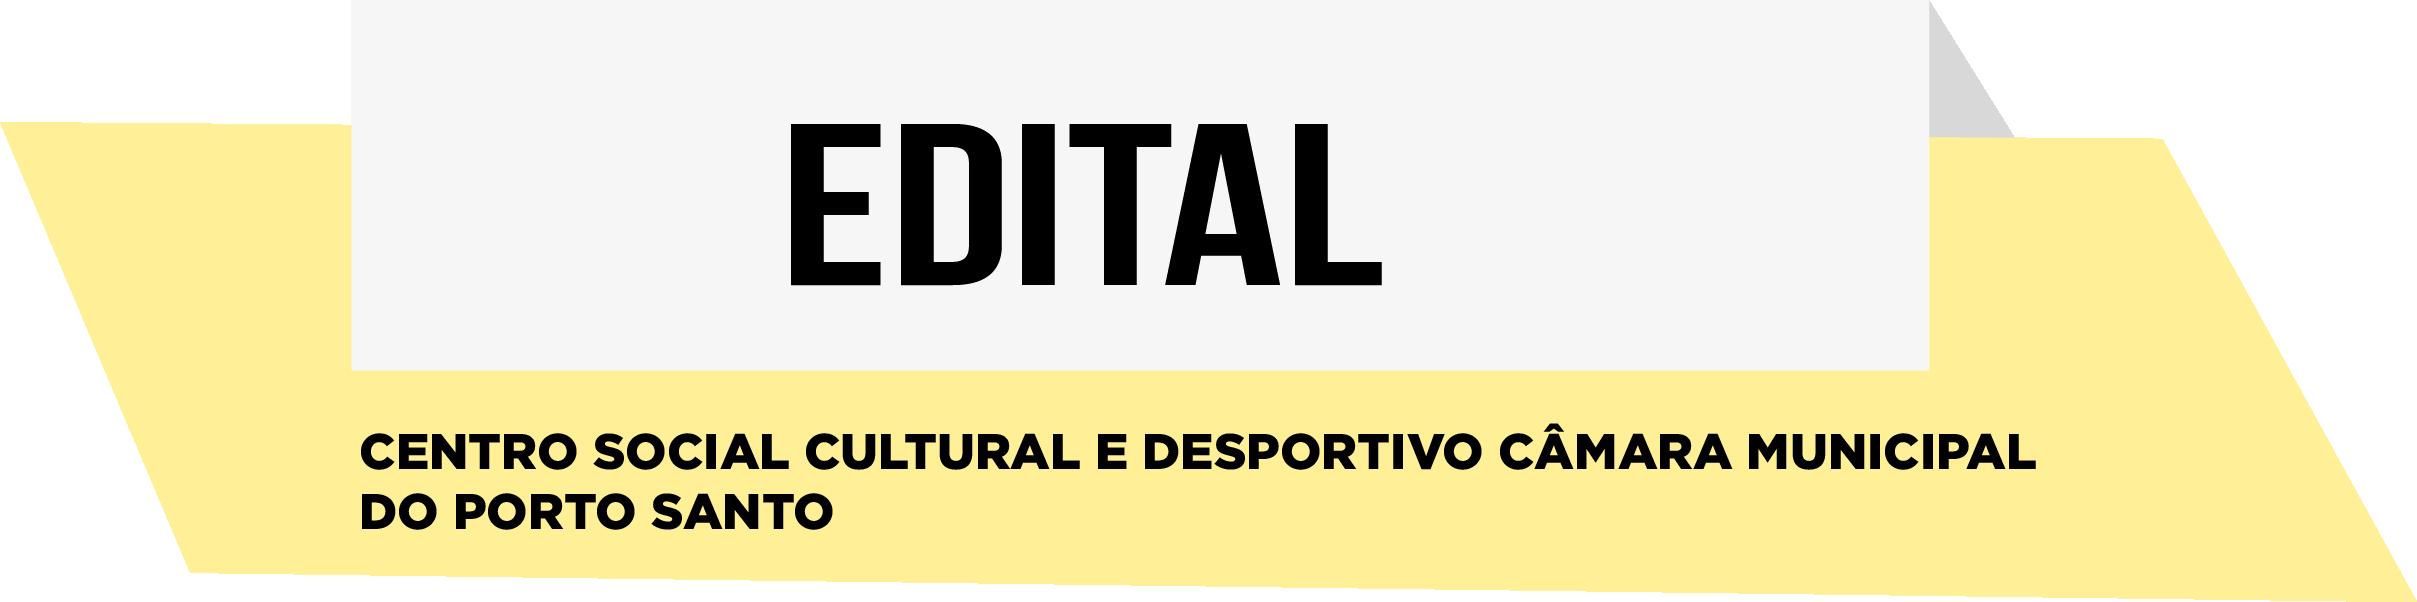 EDITAL-Centro Social Cultural e Desportivo Câmara Municipal do Porto Santo